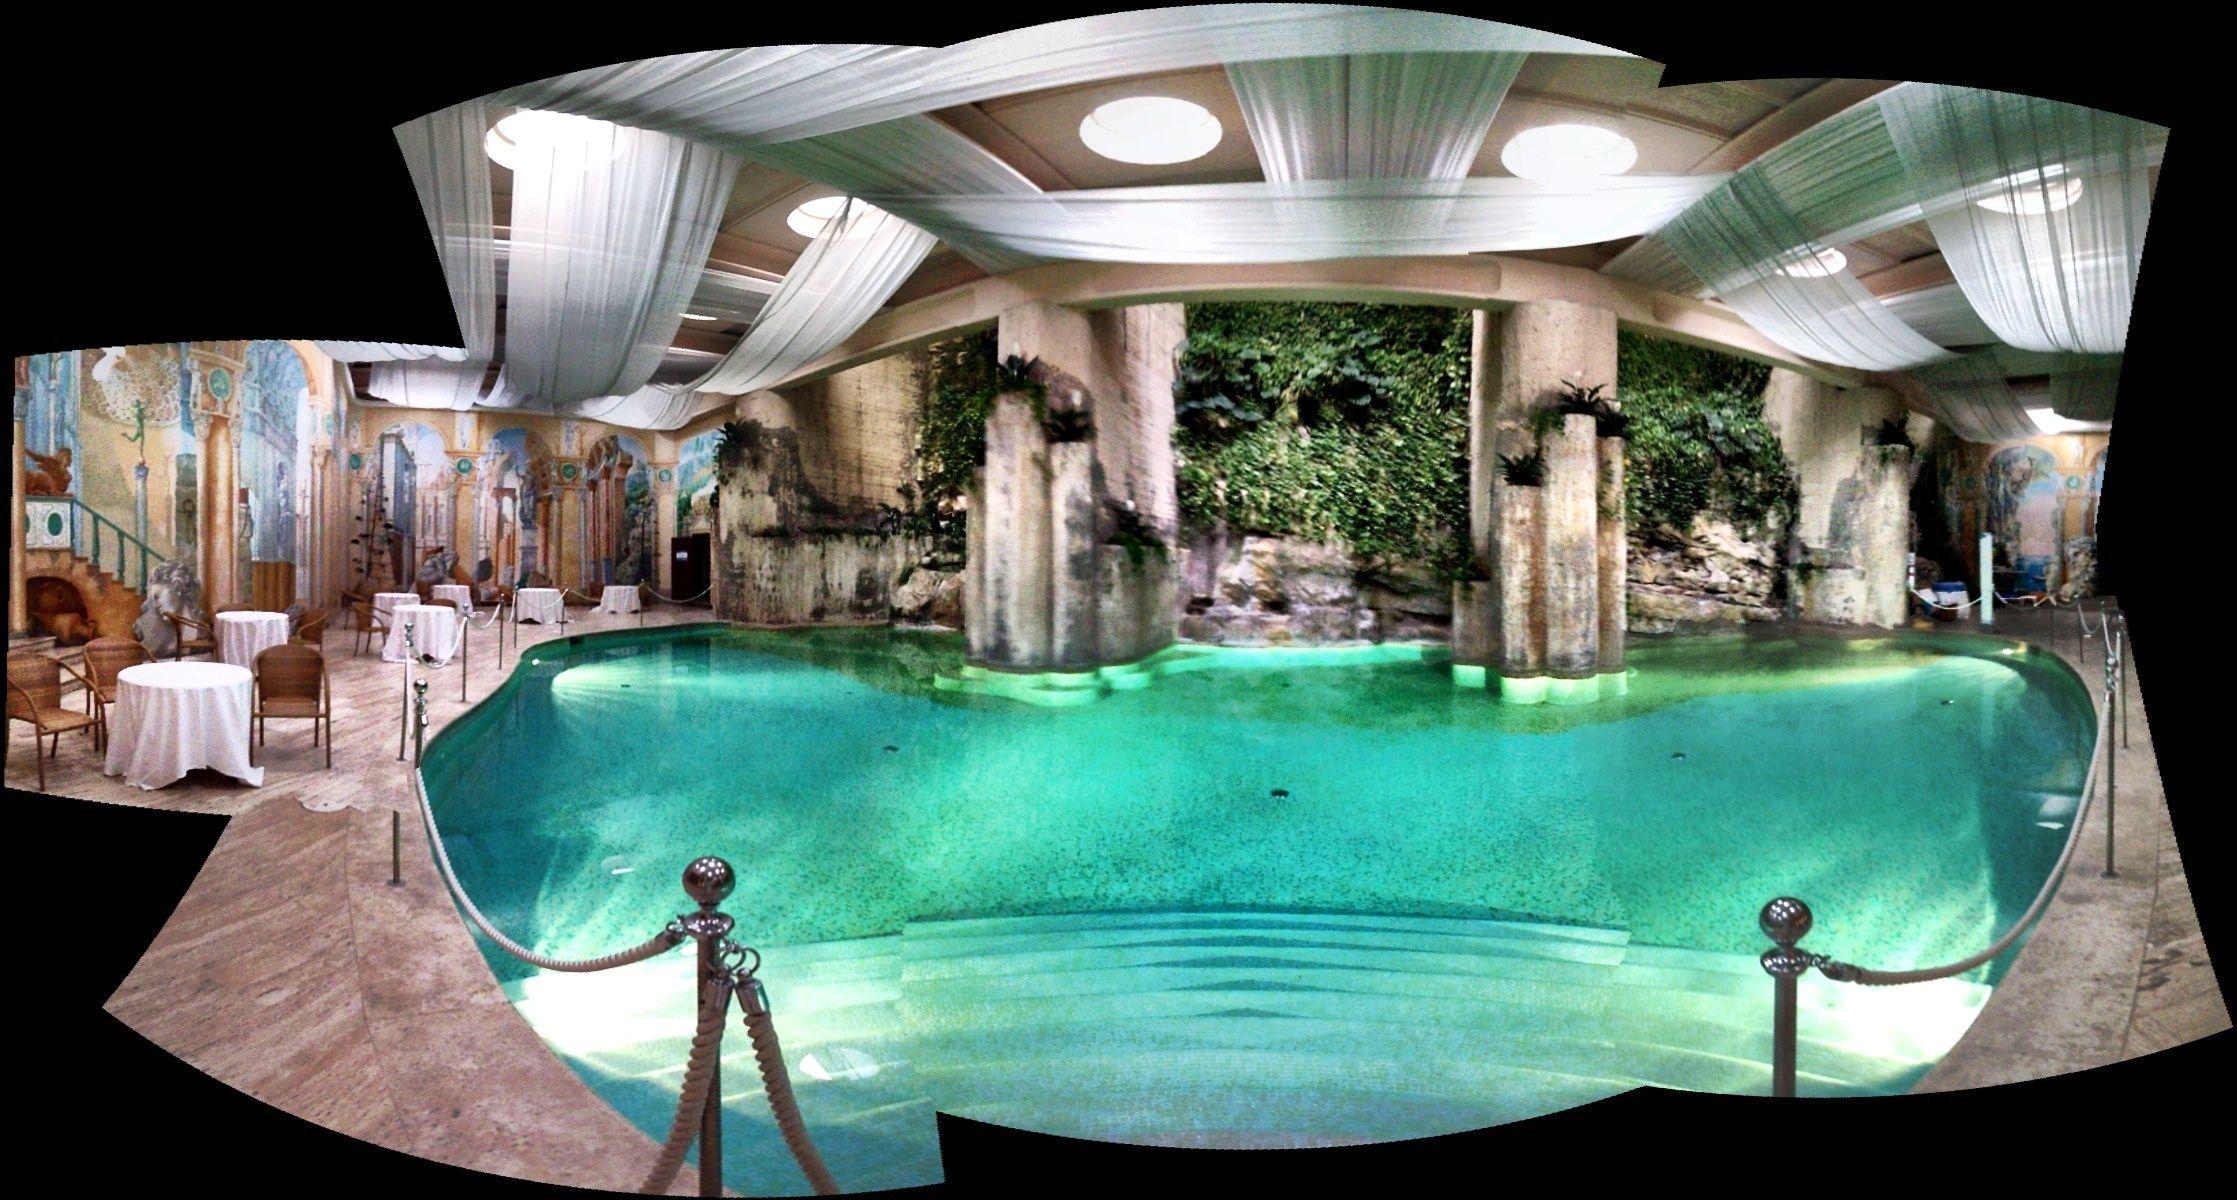 Hilton Sorrento Palace Indoor Pool Sorrento Italy The Amalfi Coast Pinterest Sorrento